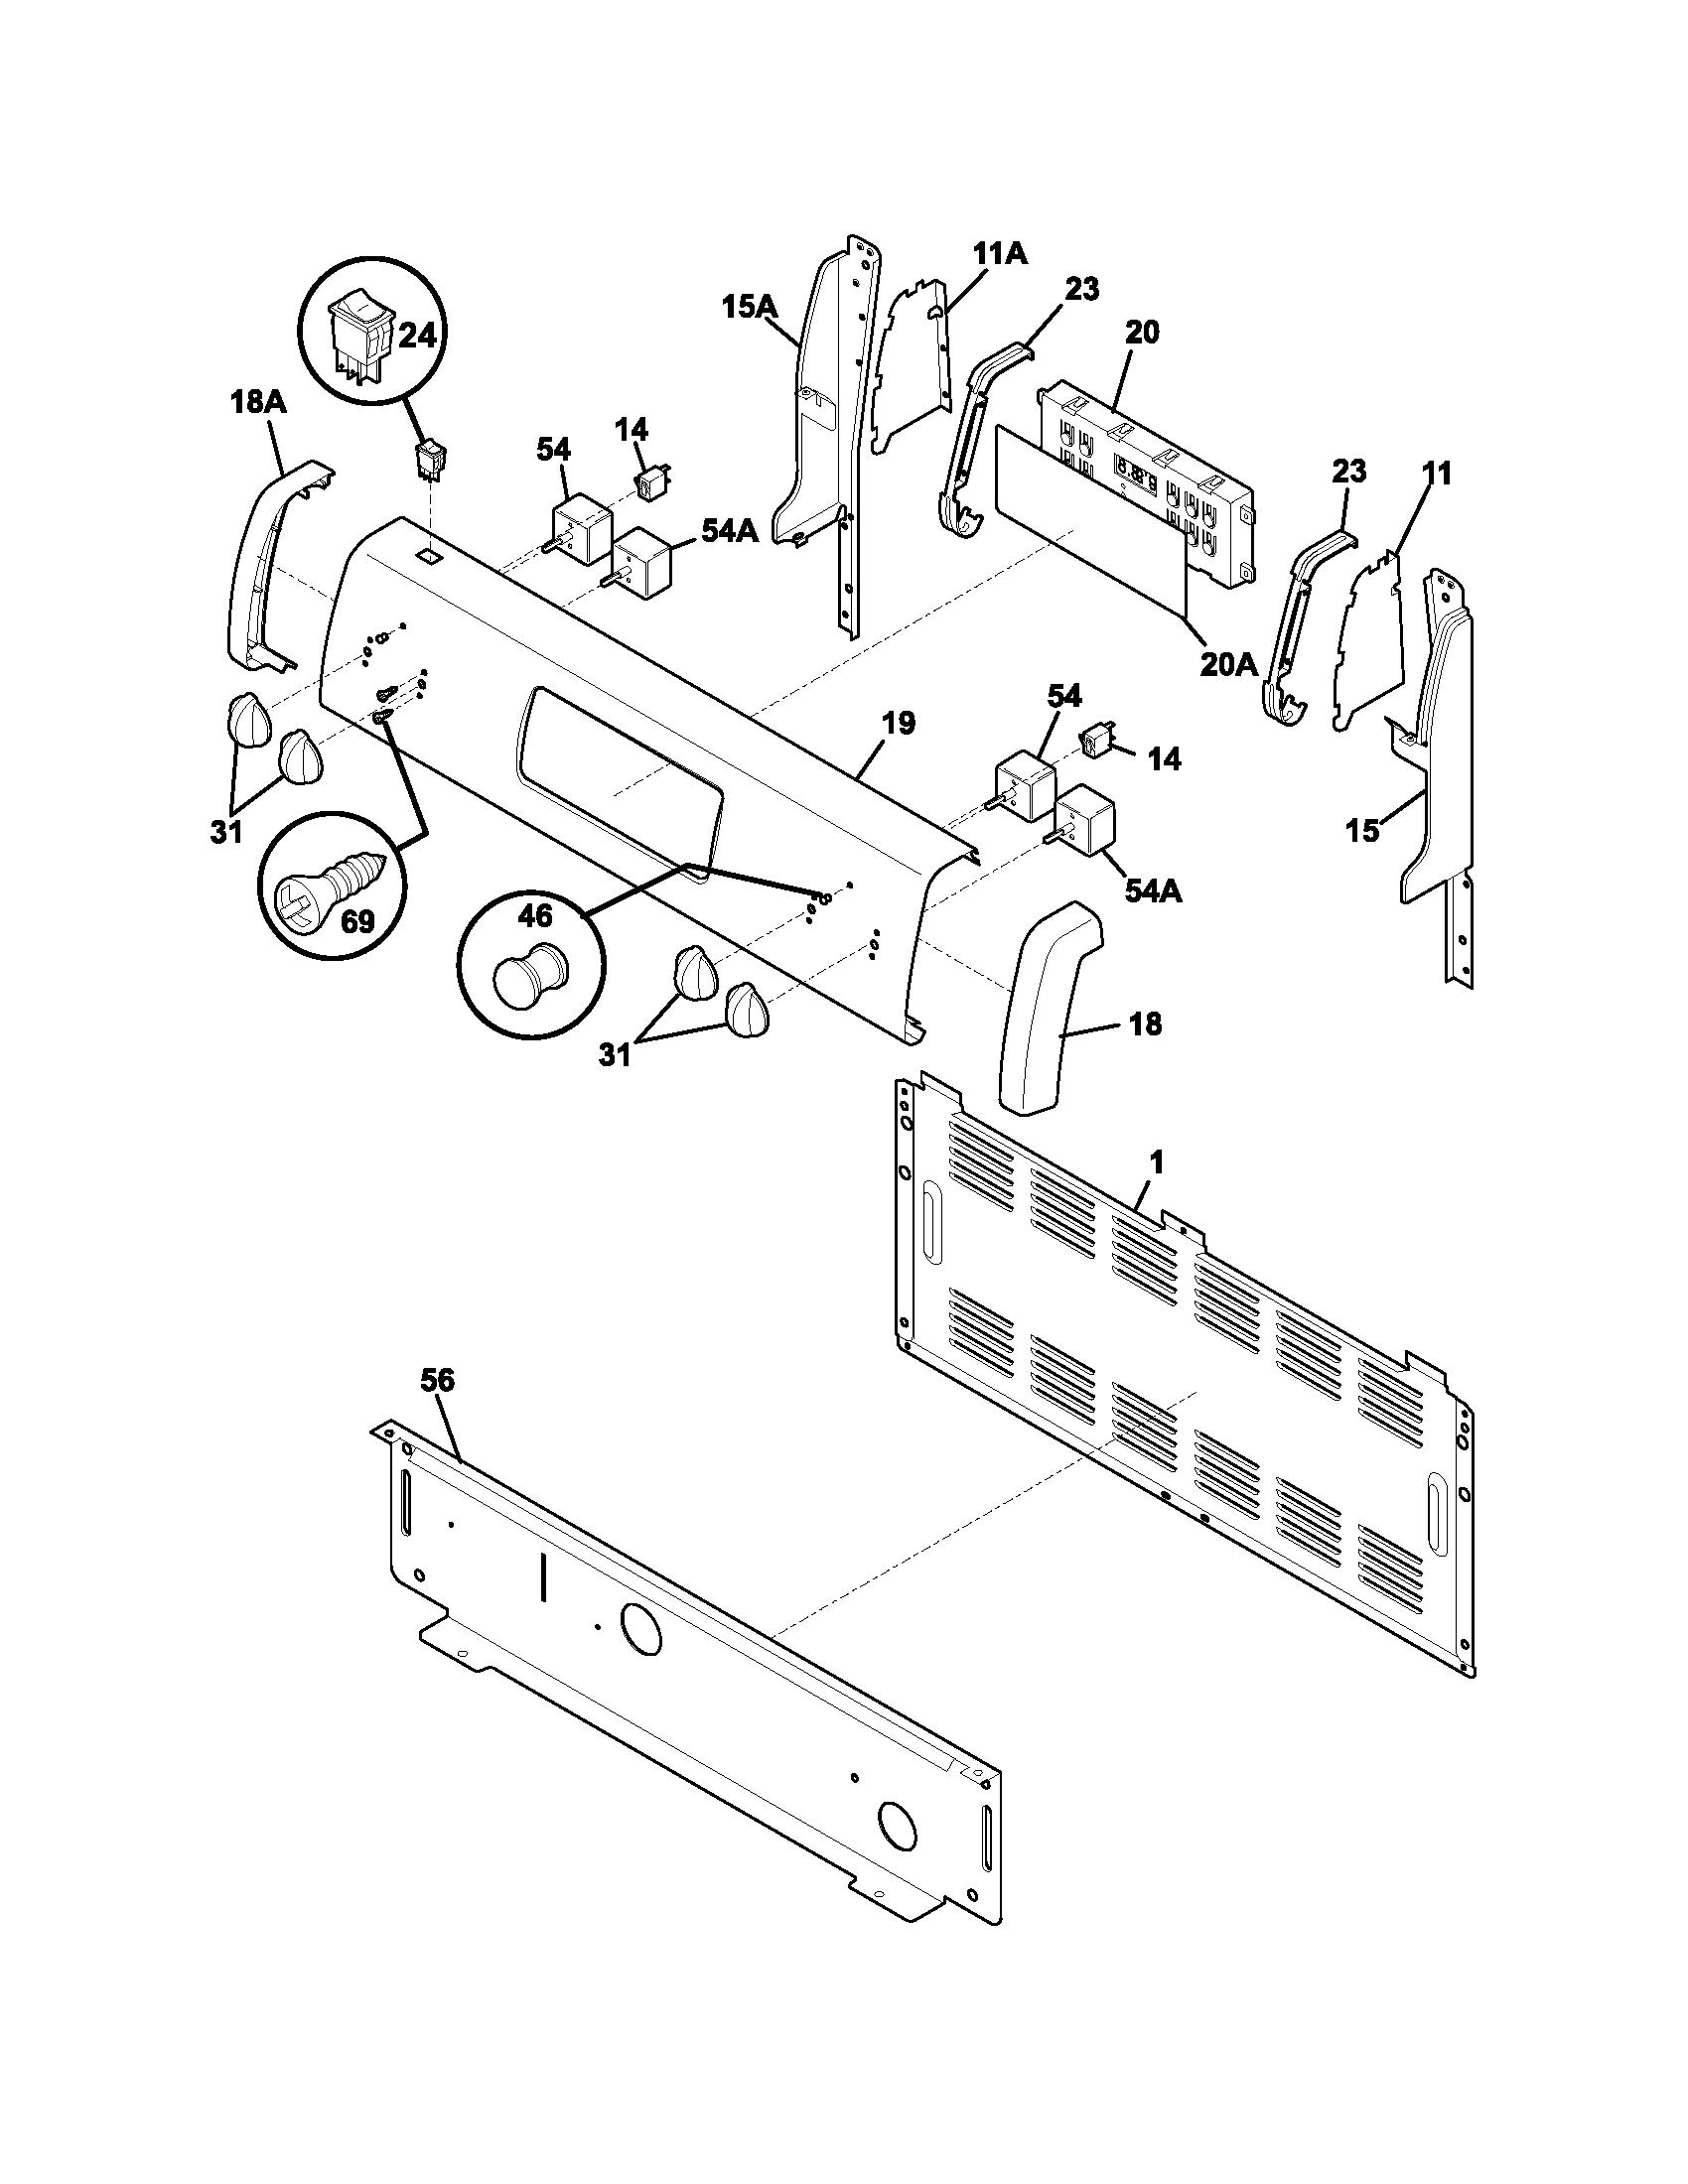 fef352aug electric range wiring diagram parts diagram